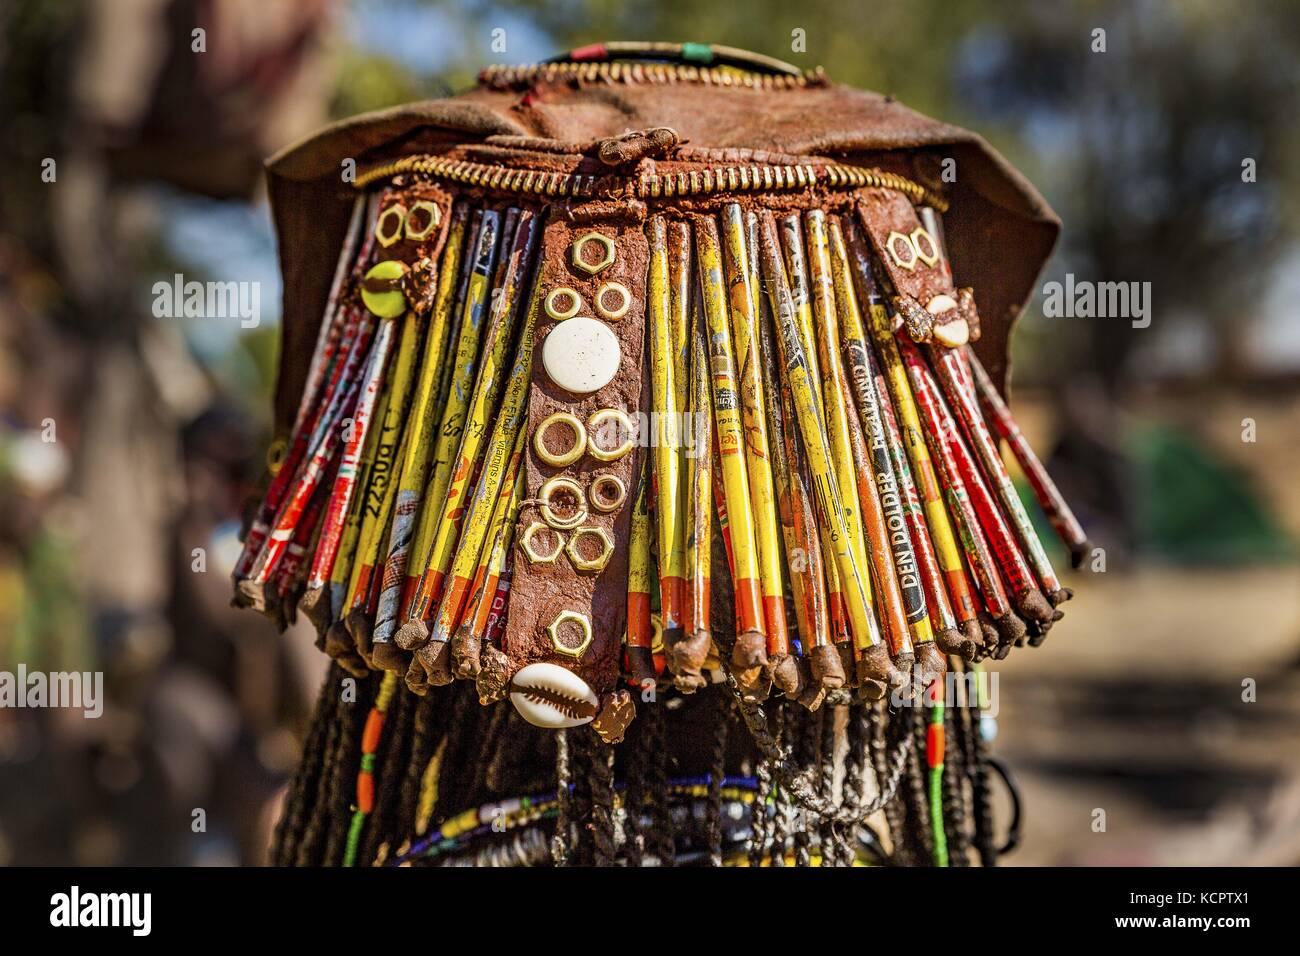 Angola. 23rd July, 2016. July 23, 2016 - Angola - Elaborate headdress of a Mucawana girl (also called Hacaona, Muhacaona). - Stock Image